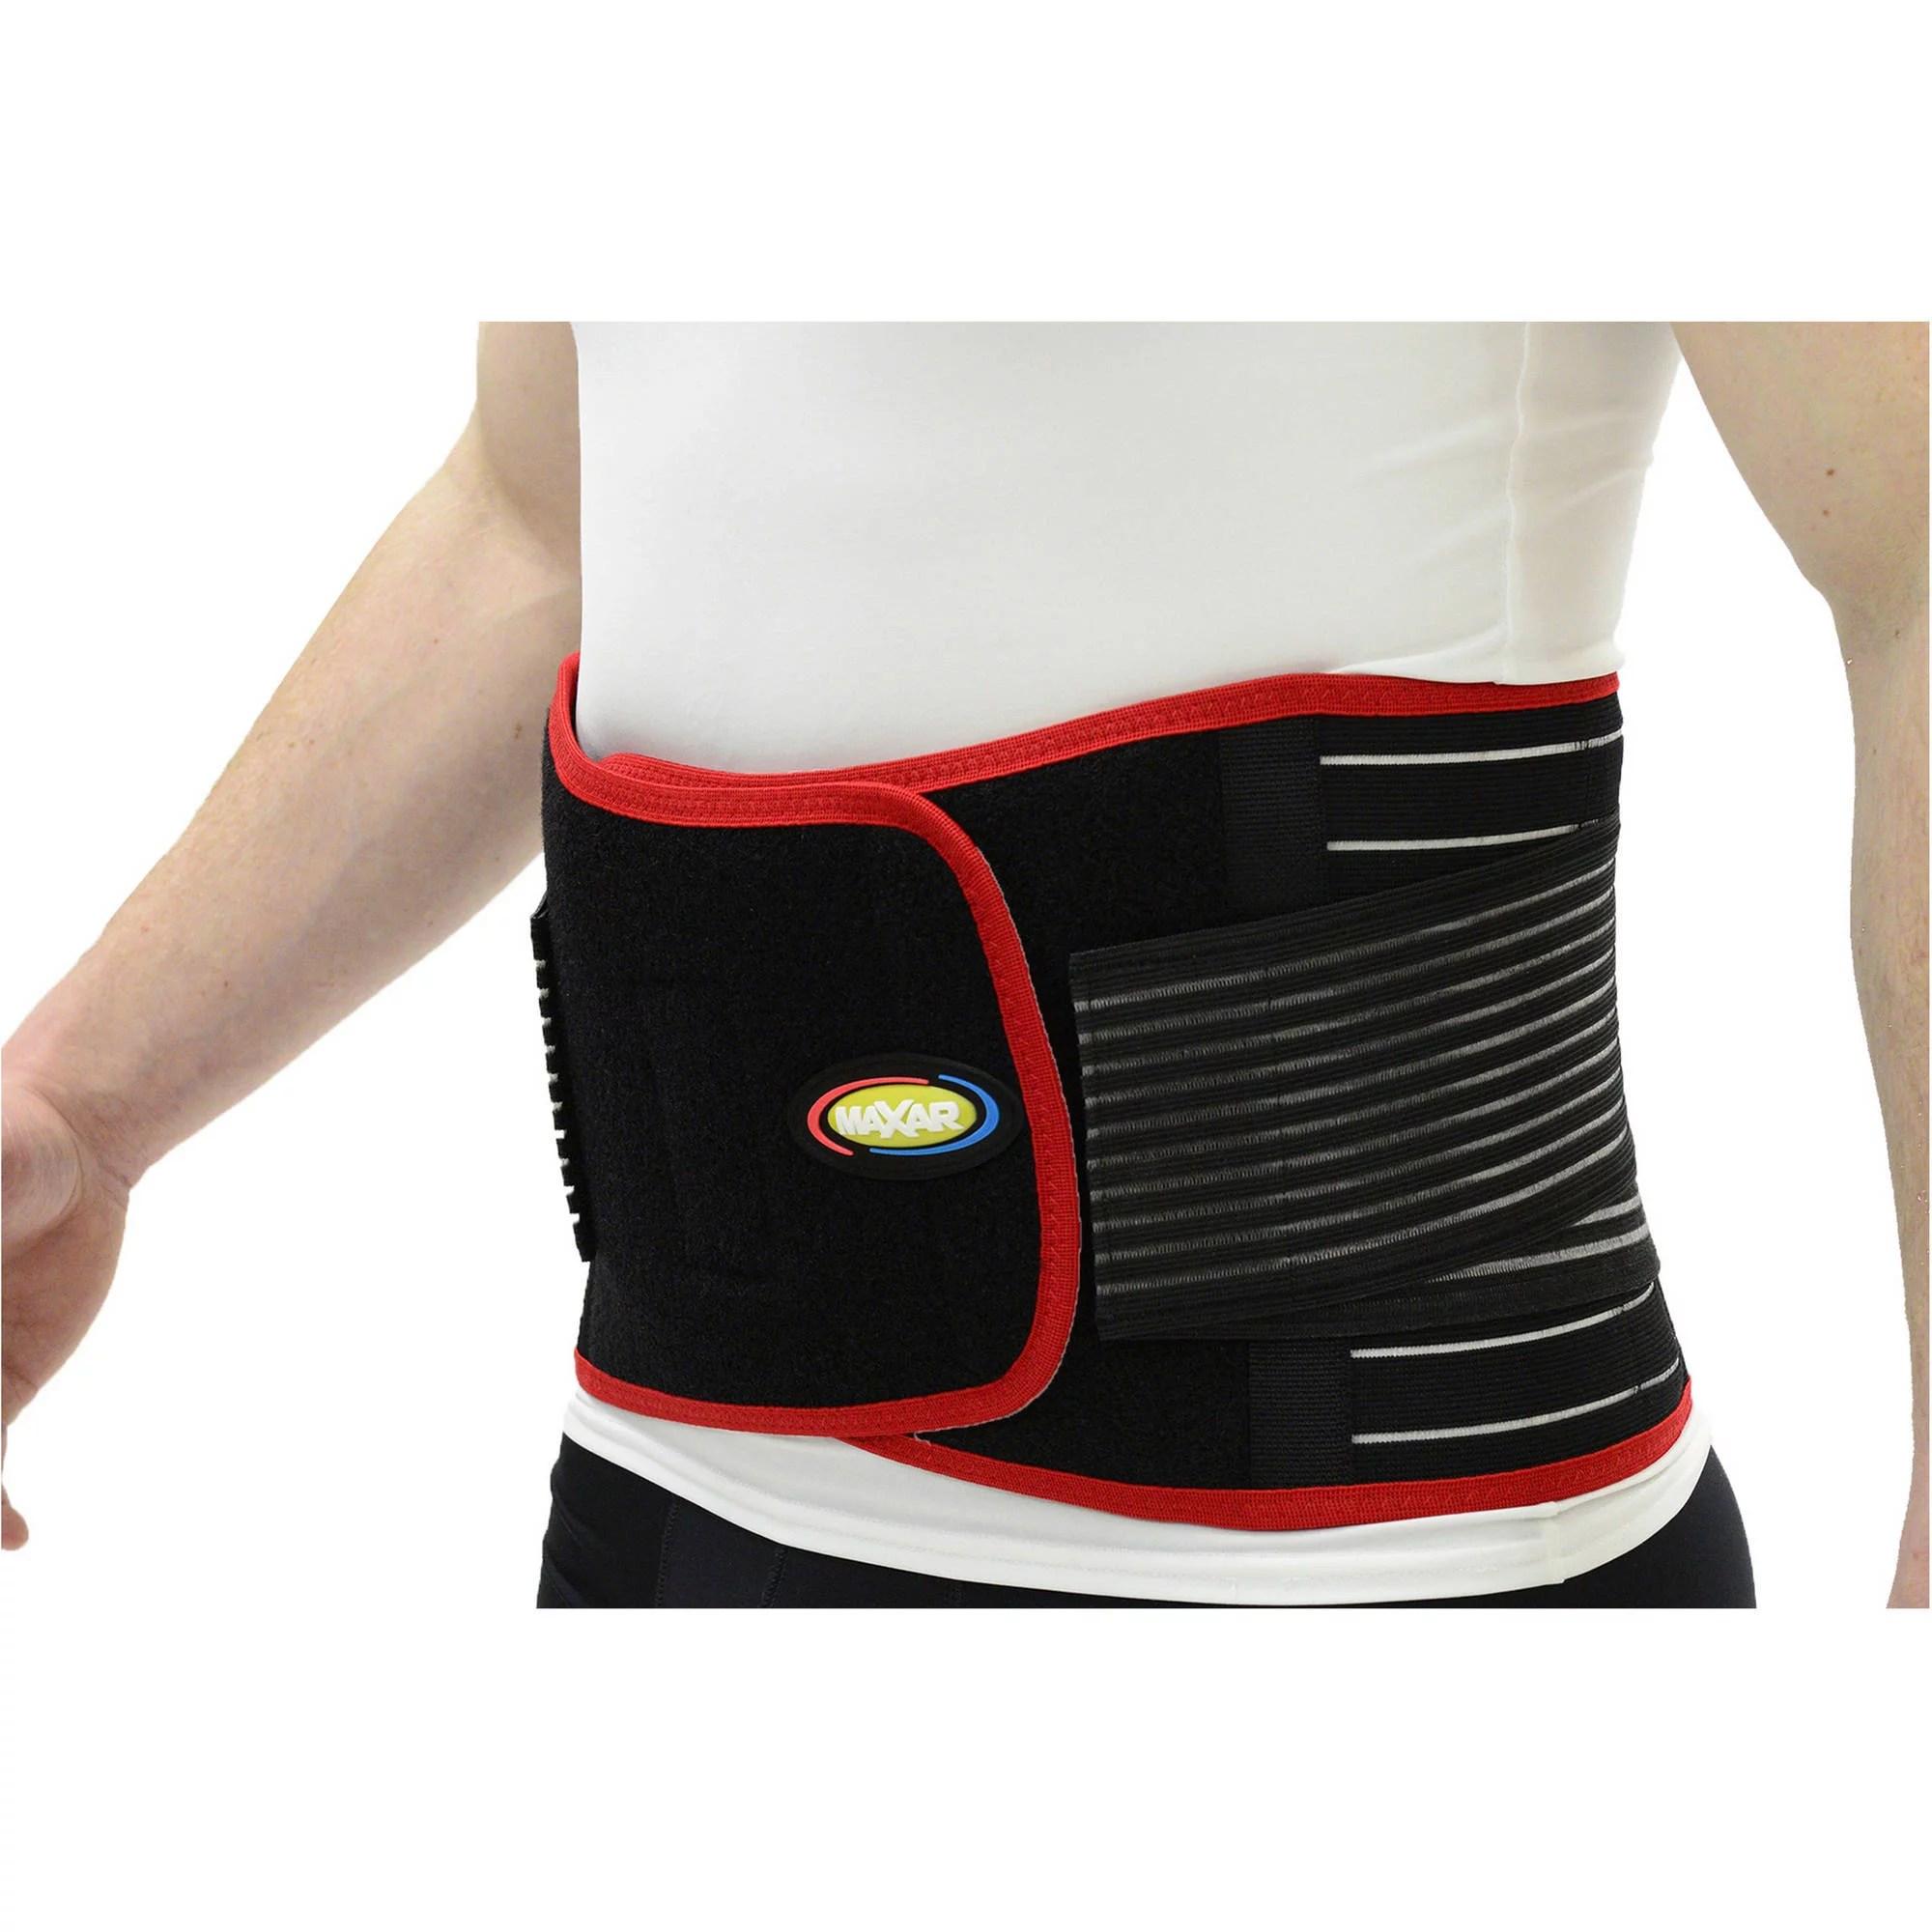 Maxar Bio Magnetic Back Support Belt Bms 512